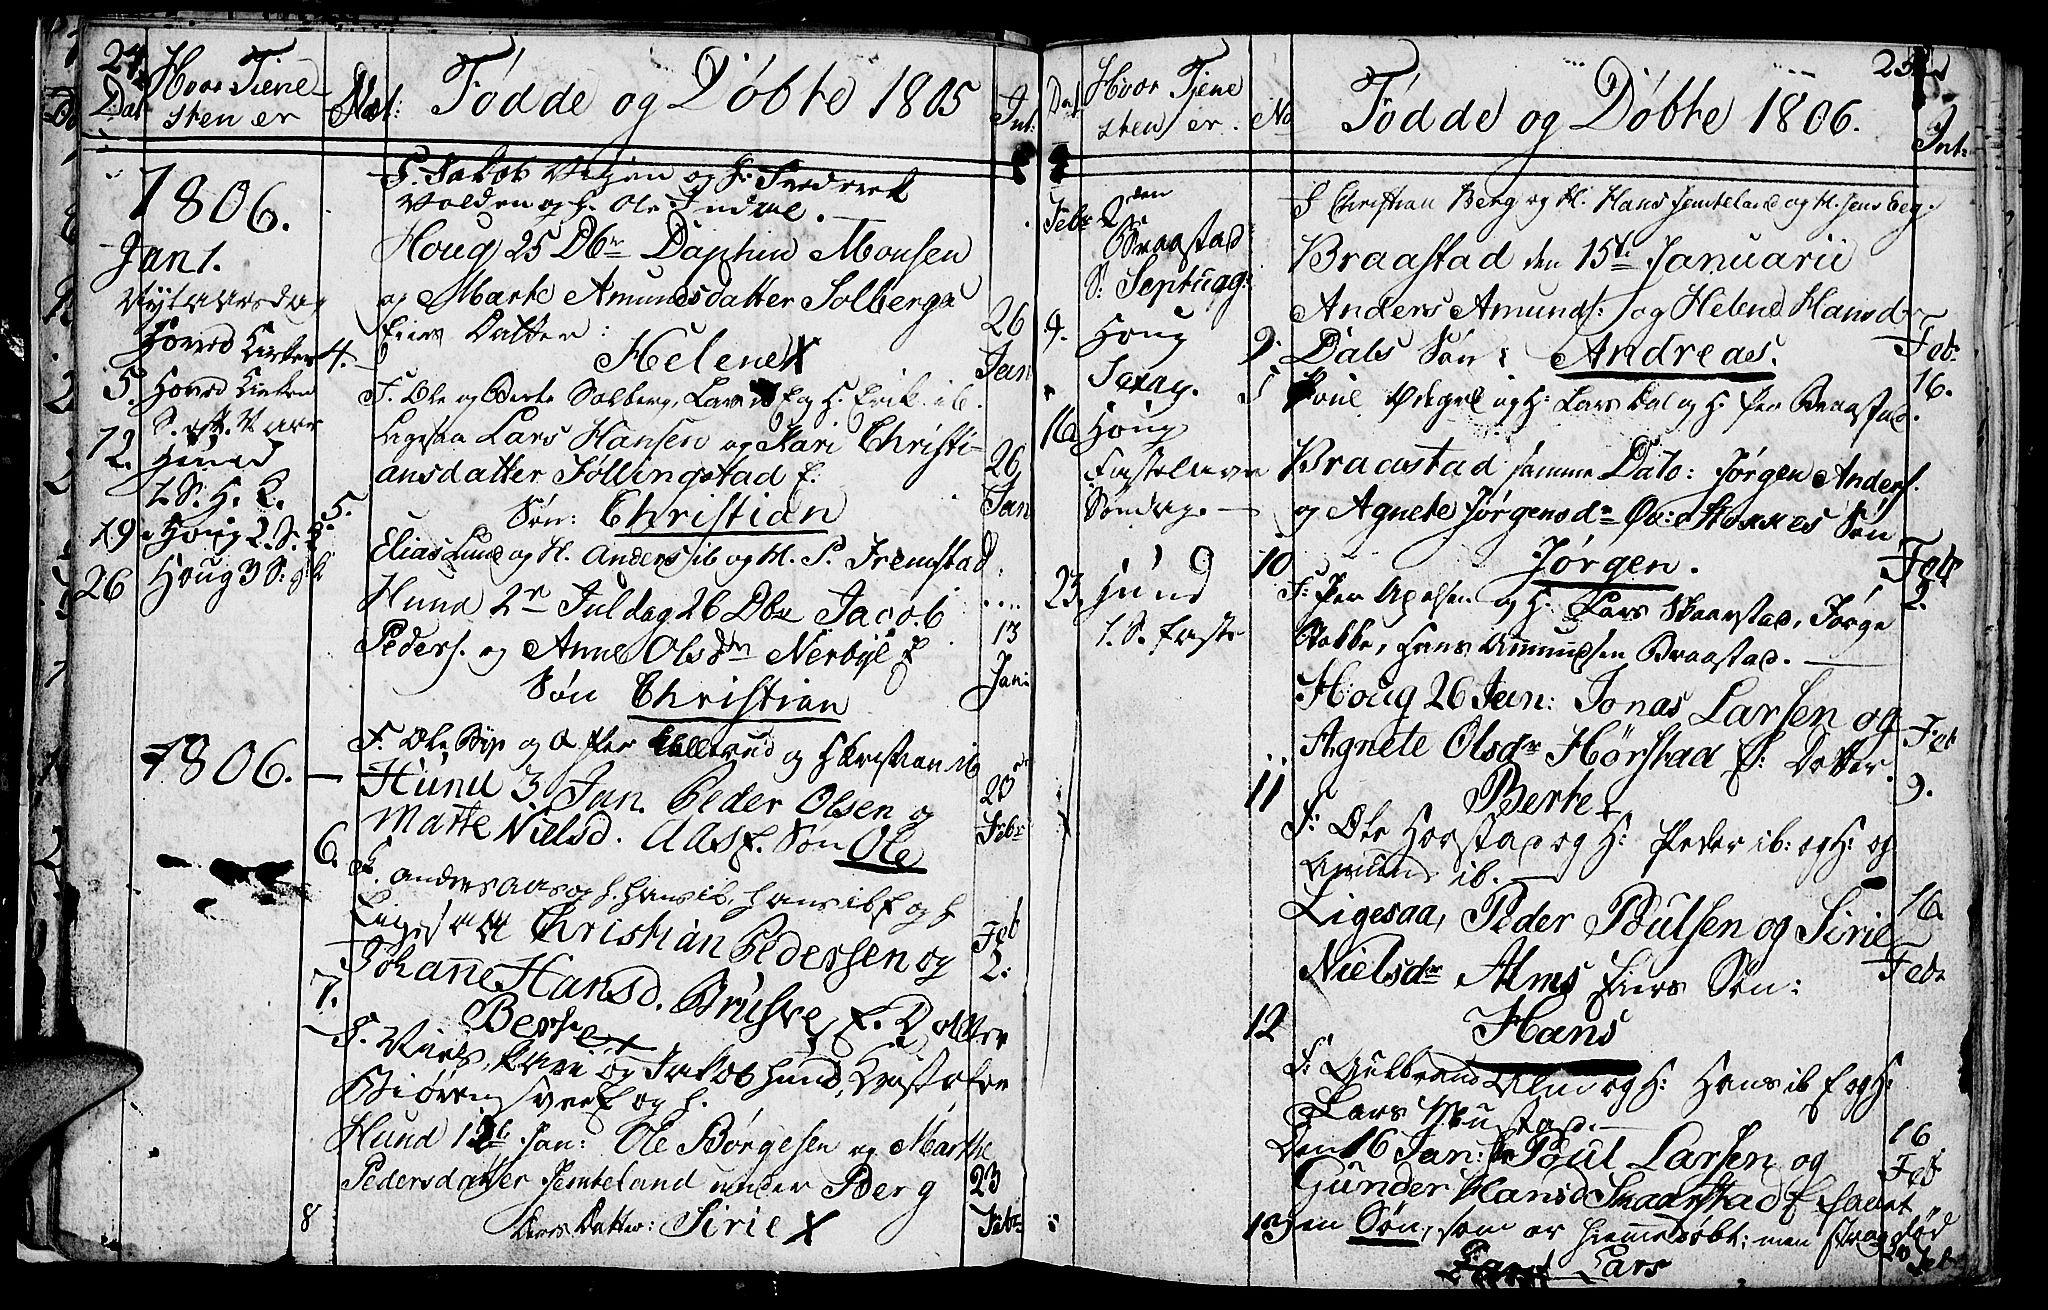 SAH, Vardal prestekontor, H/Ha/Hab/L0003: Klokkerbok nr. 3, 1803-1808, s. 24-25